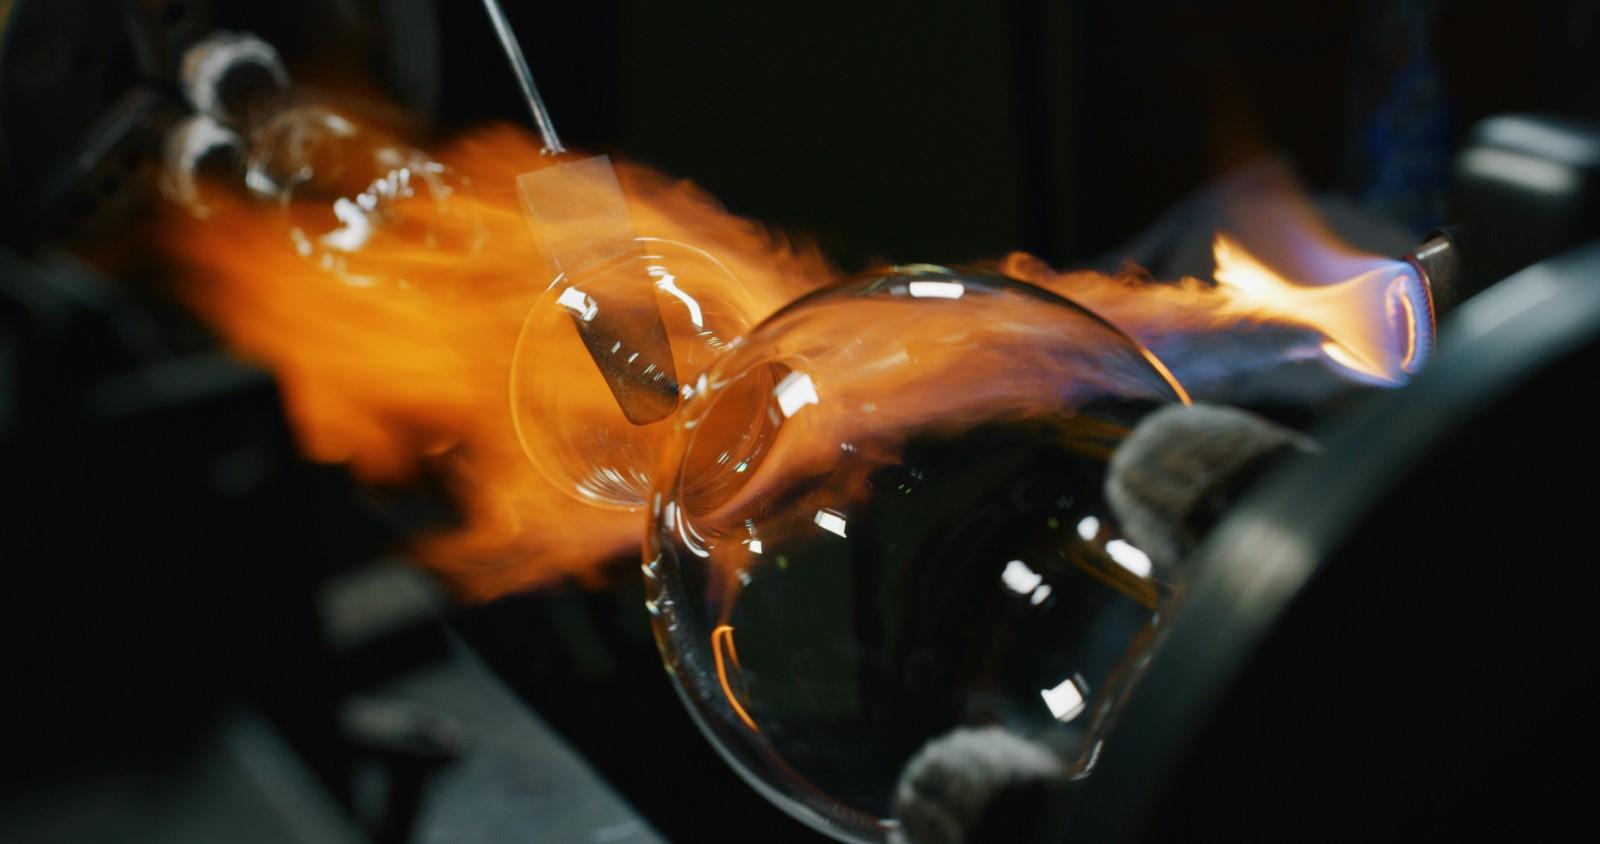 soffieria-villa-blown-glass-objects-milan-thumbnail